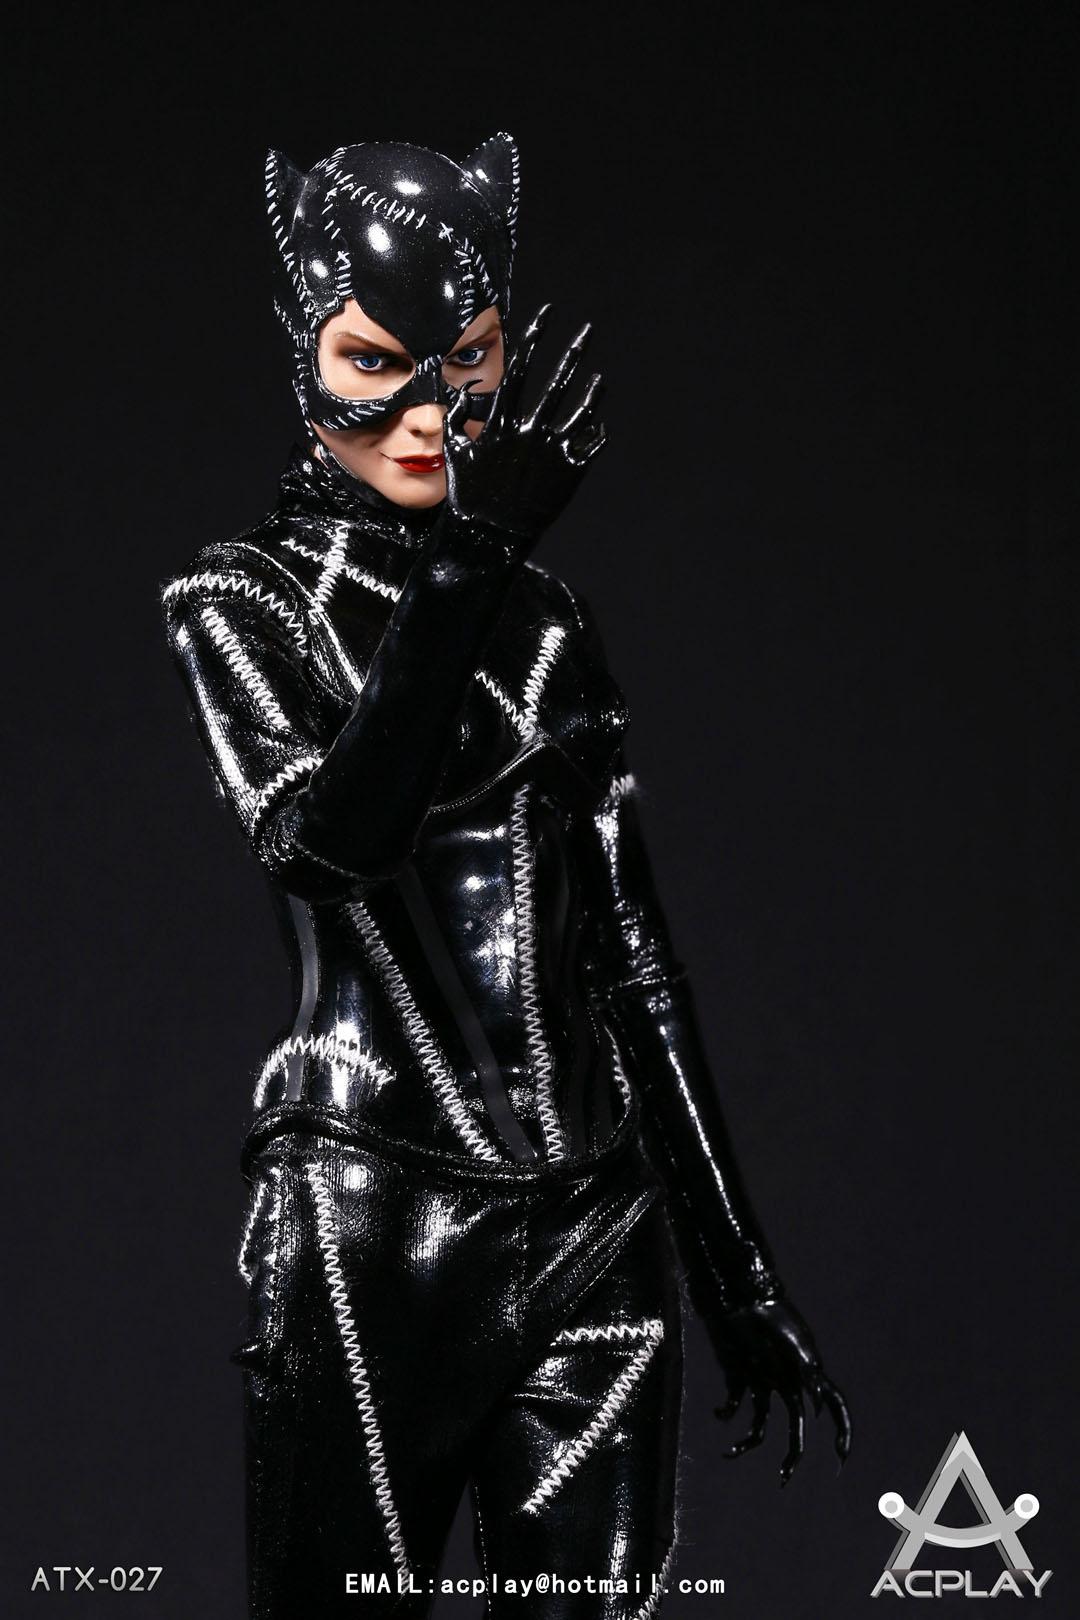 acp-catwoman06